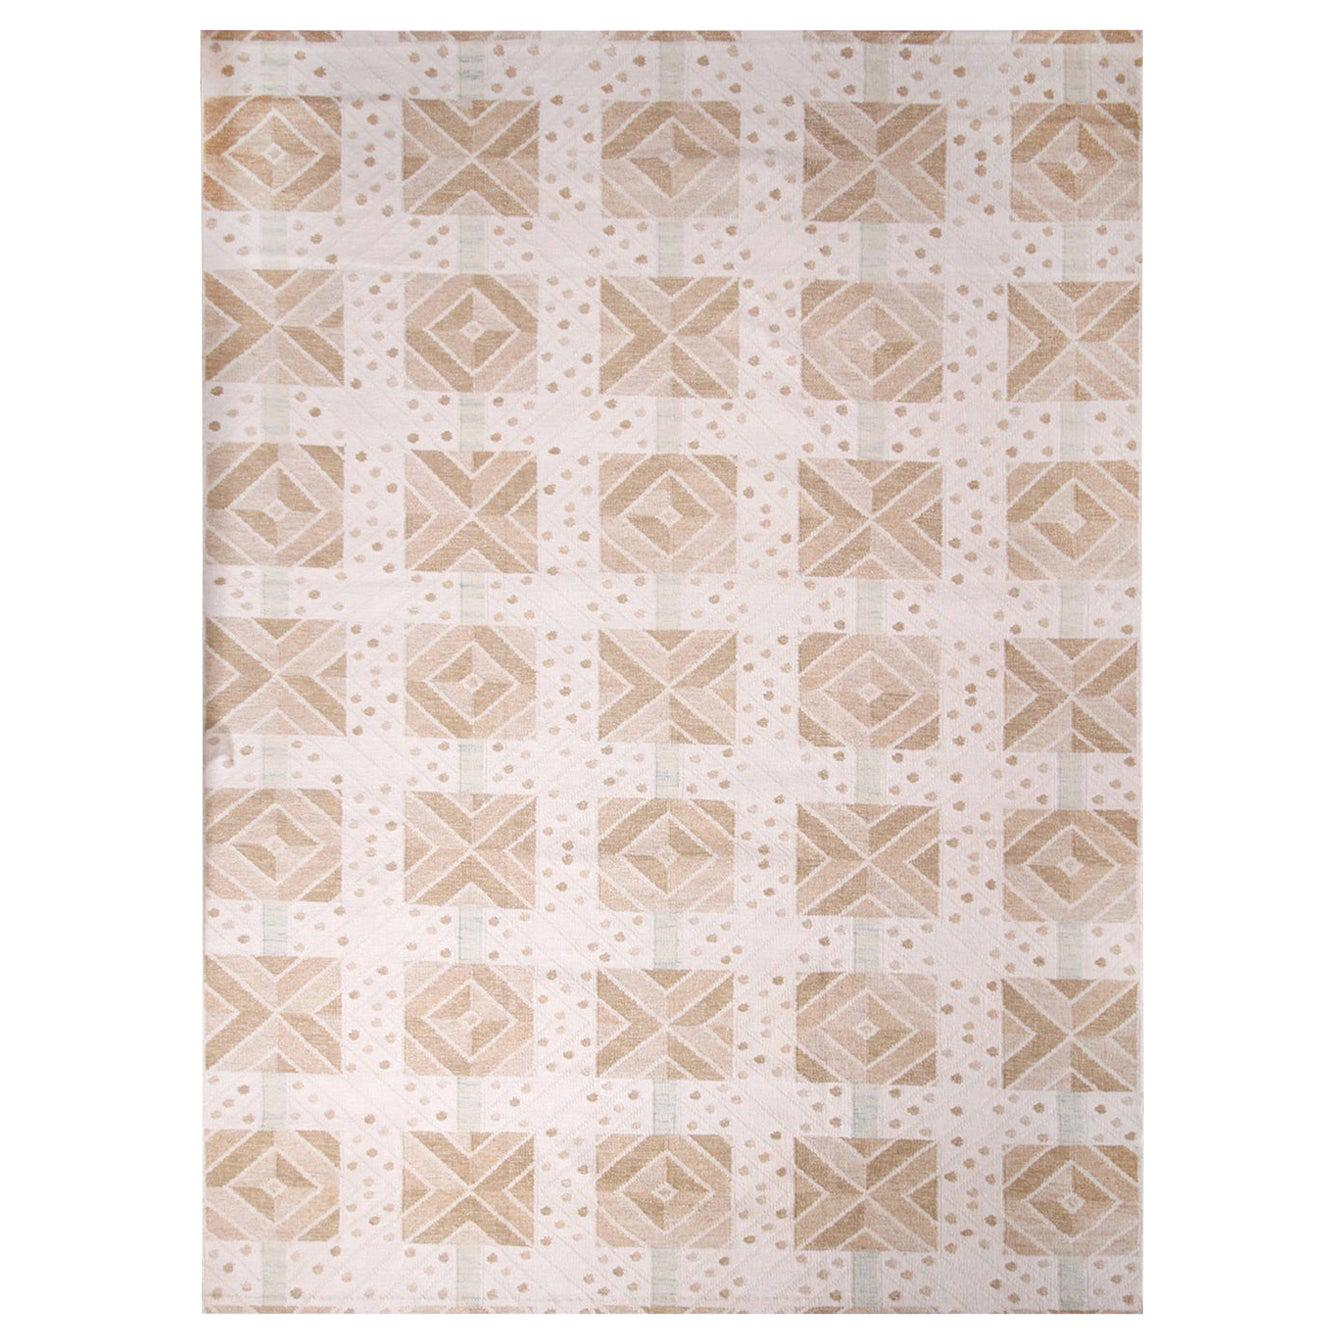 Rug & Kilim's Scandinavian Inspired Cream and Beige-Brown Natural Wool Kilim Rug